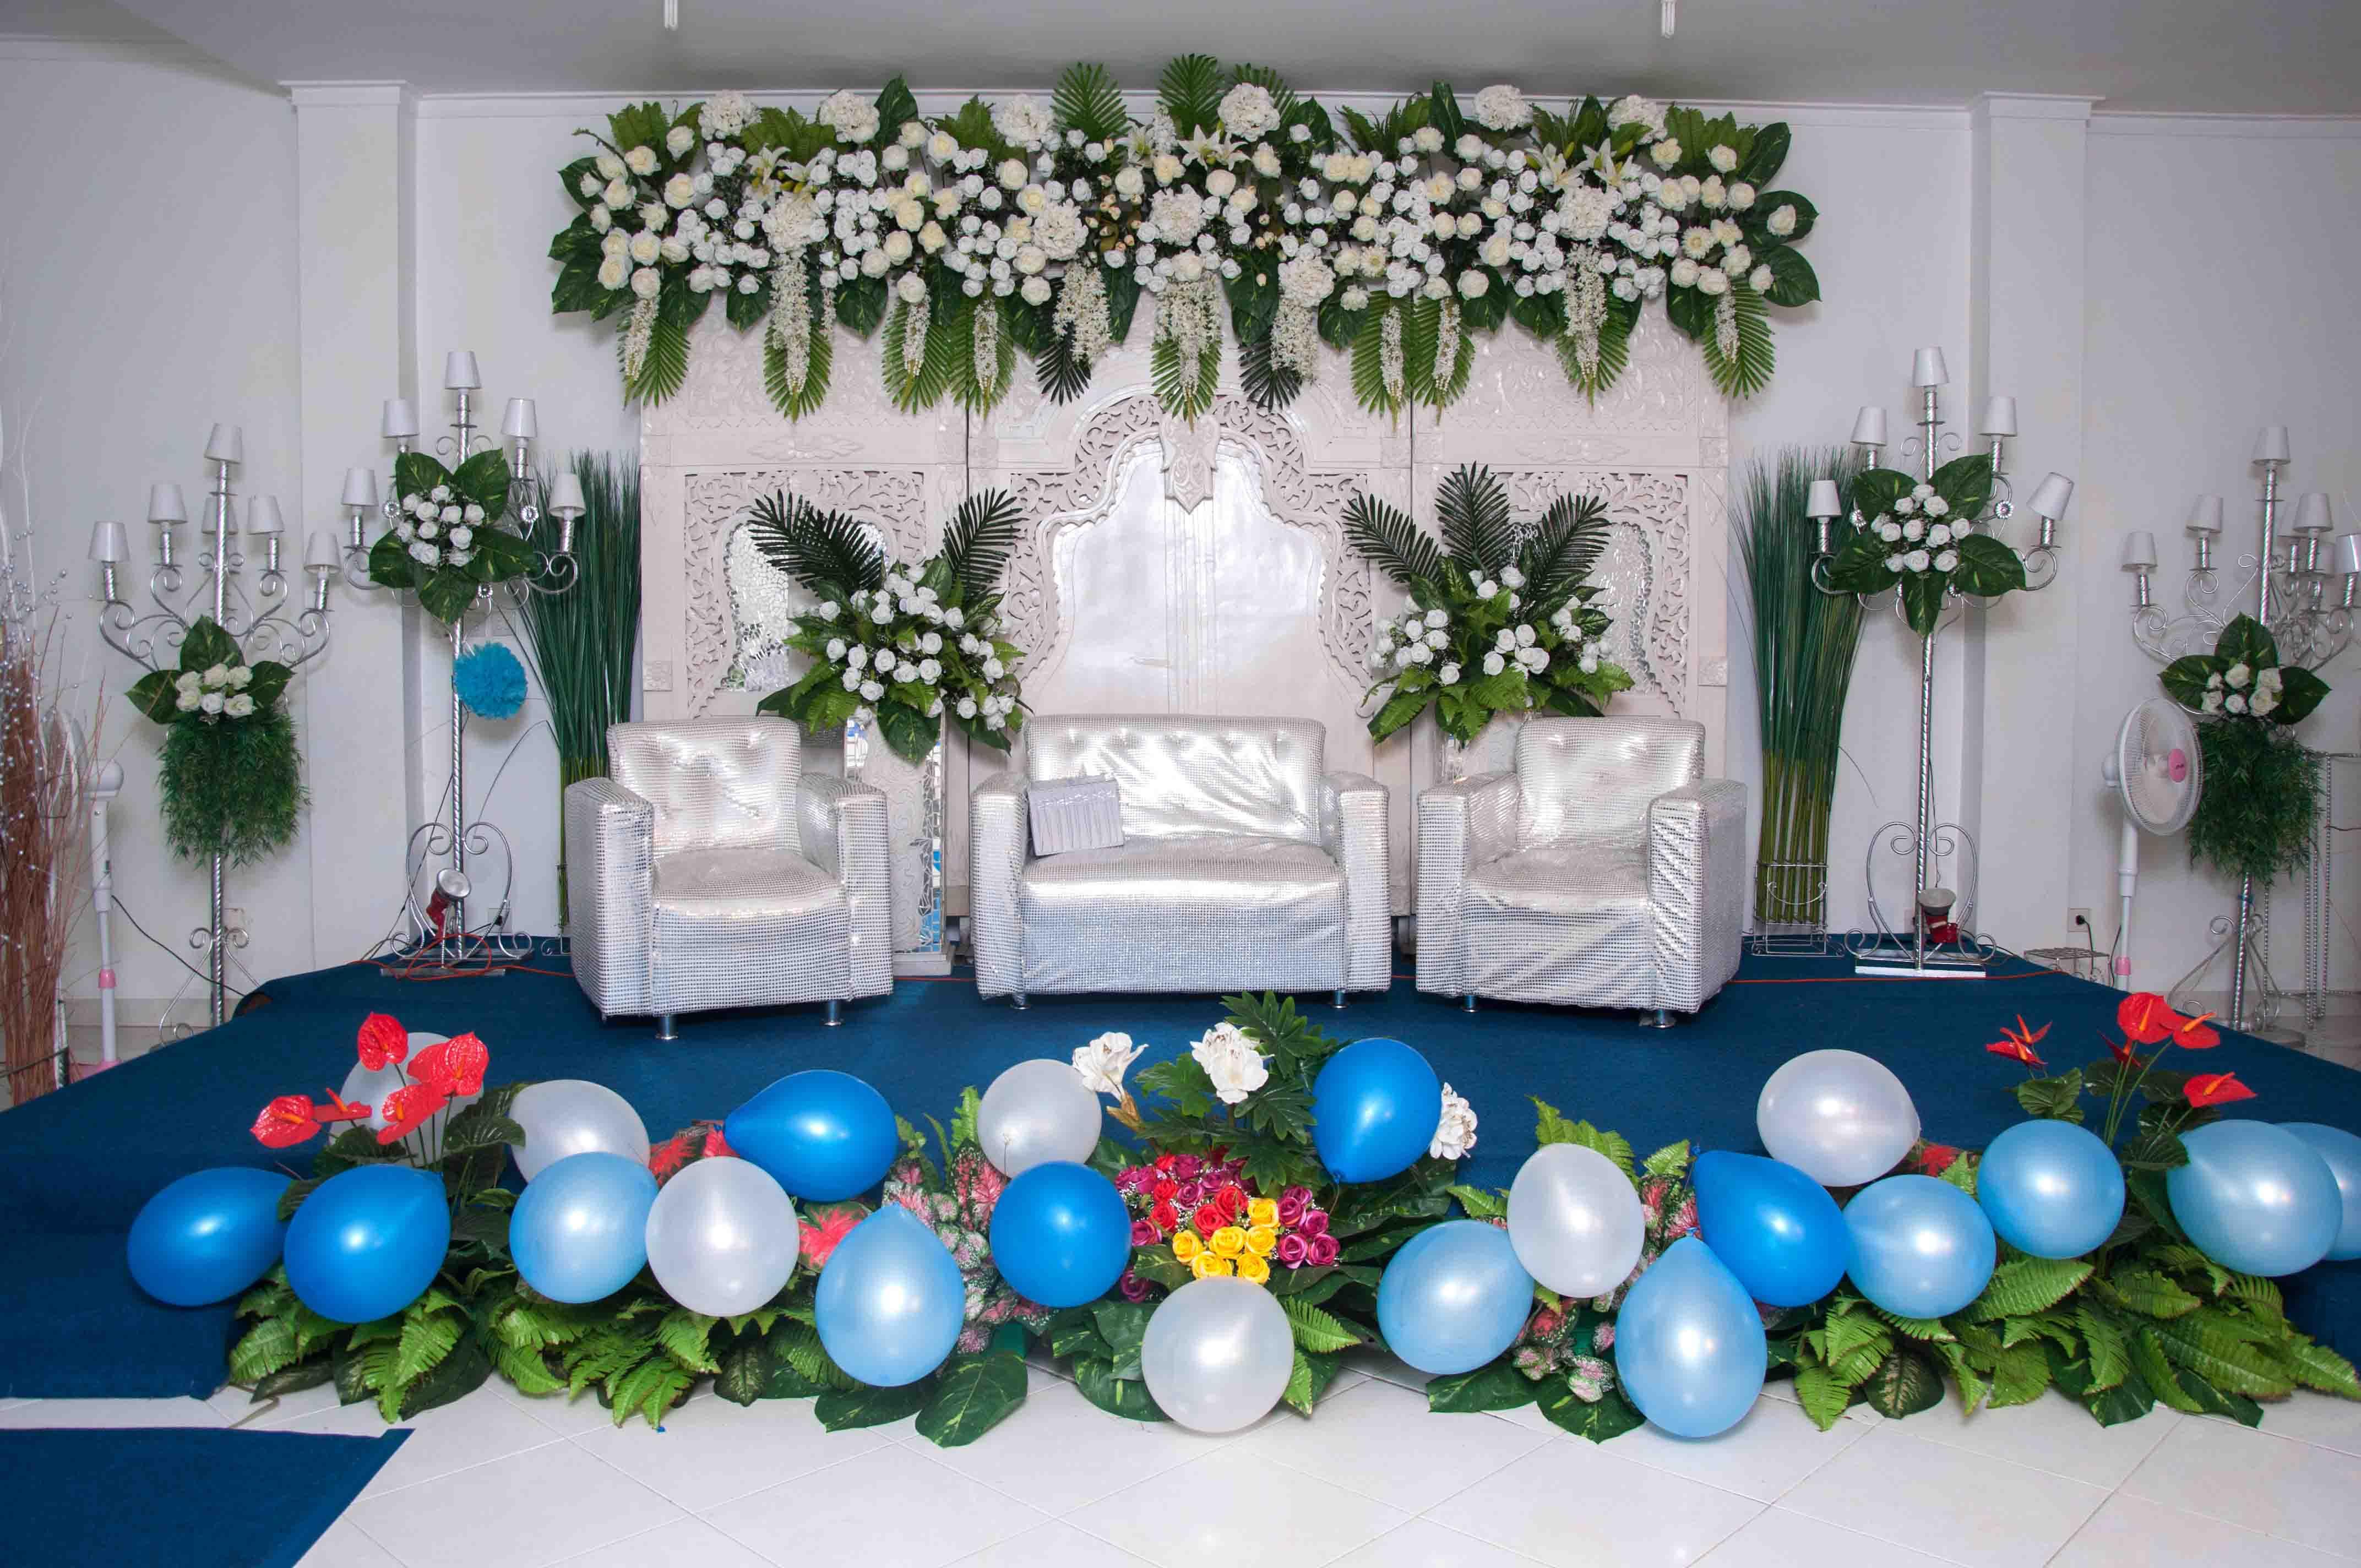 Ruang reuni ulang tahun sunatan halal bihalal bukber arisan for Dekor kamar hotel buat ulang tahun